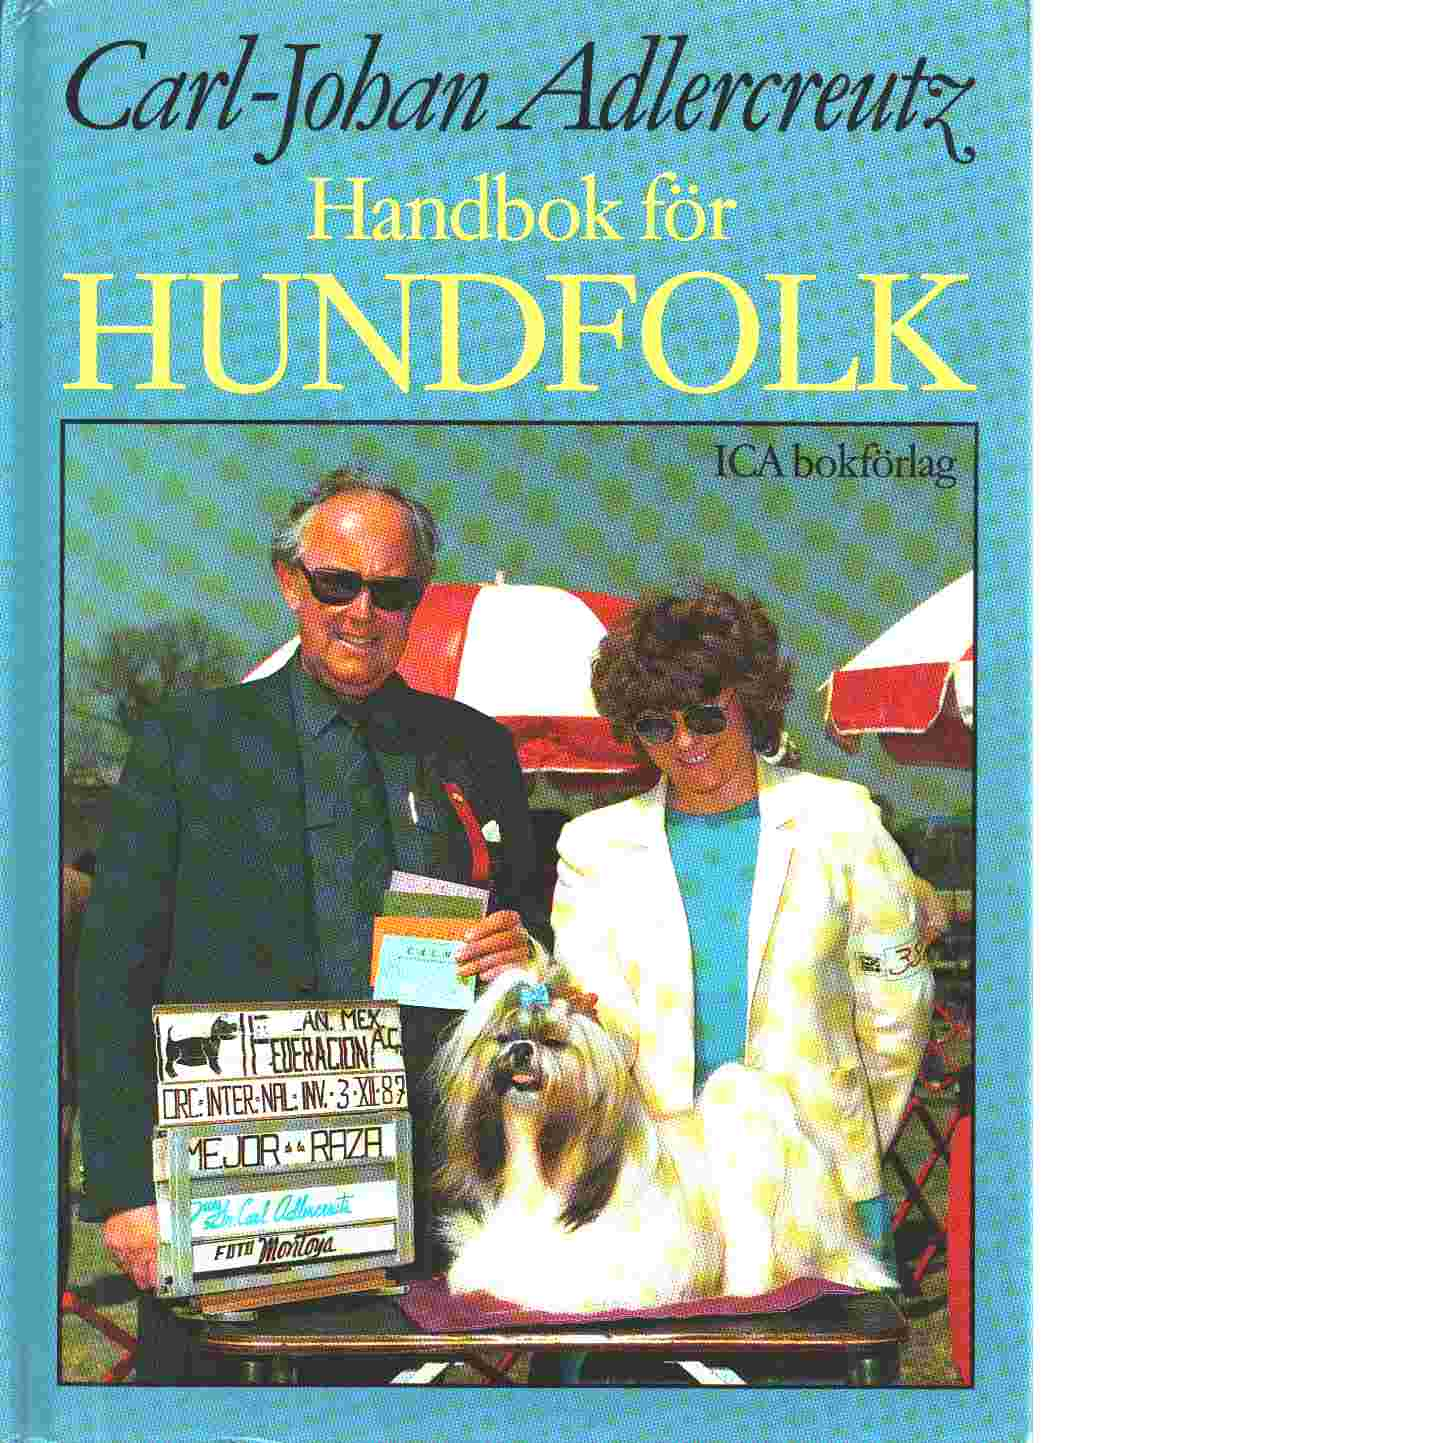 Handbok för hundfolk - Adlercreutz, Carl-Johan